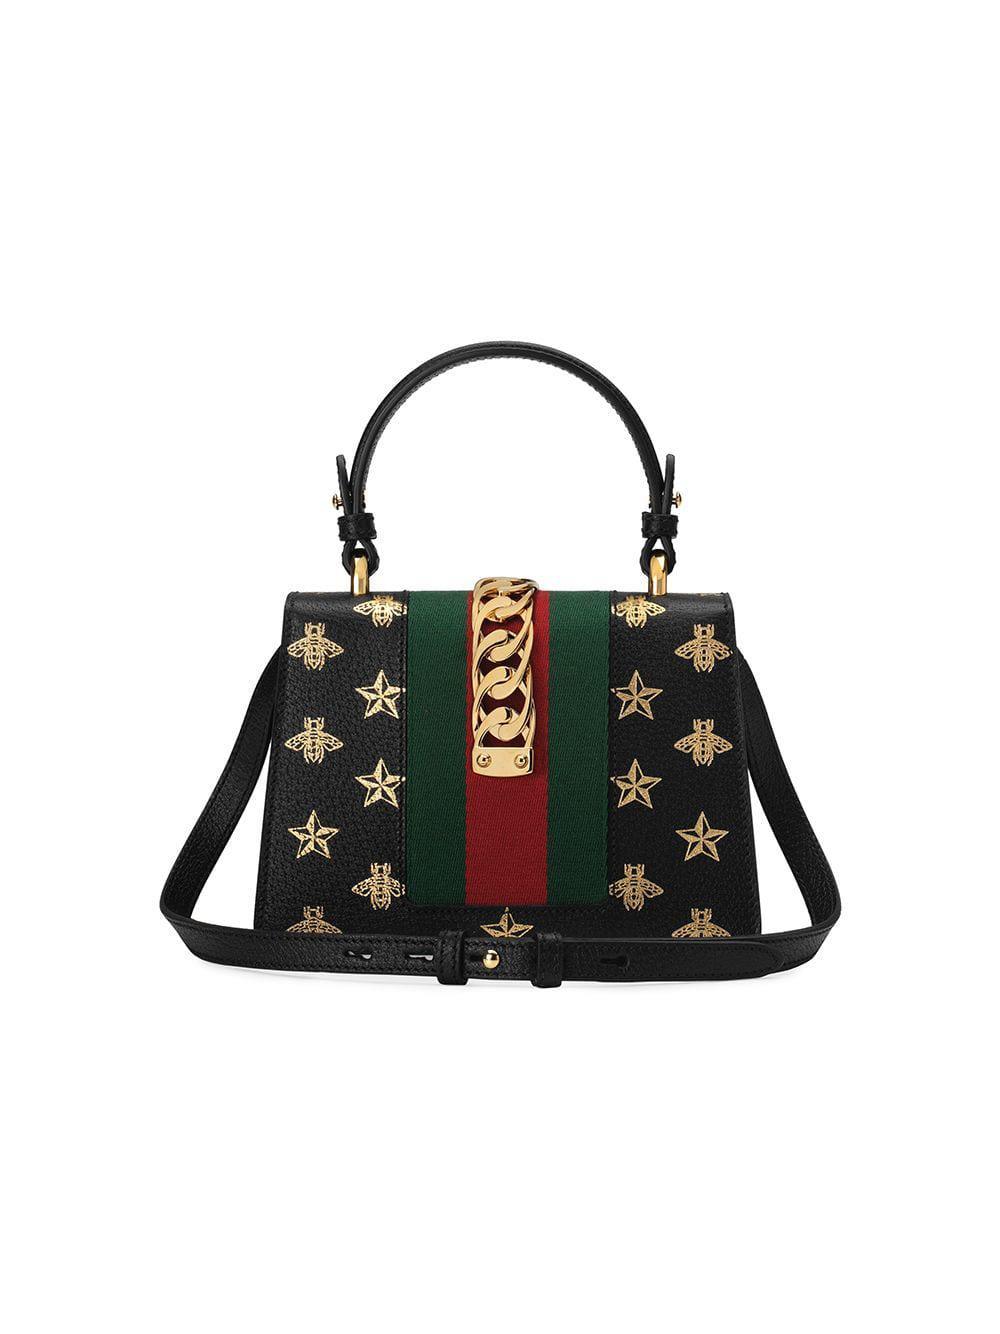 87995d8e48dc Gucci - Black Sylvie Bee Star Mini Leather Bag - Lyst. View fullscreen